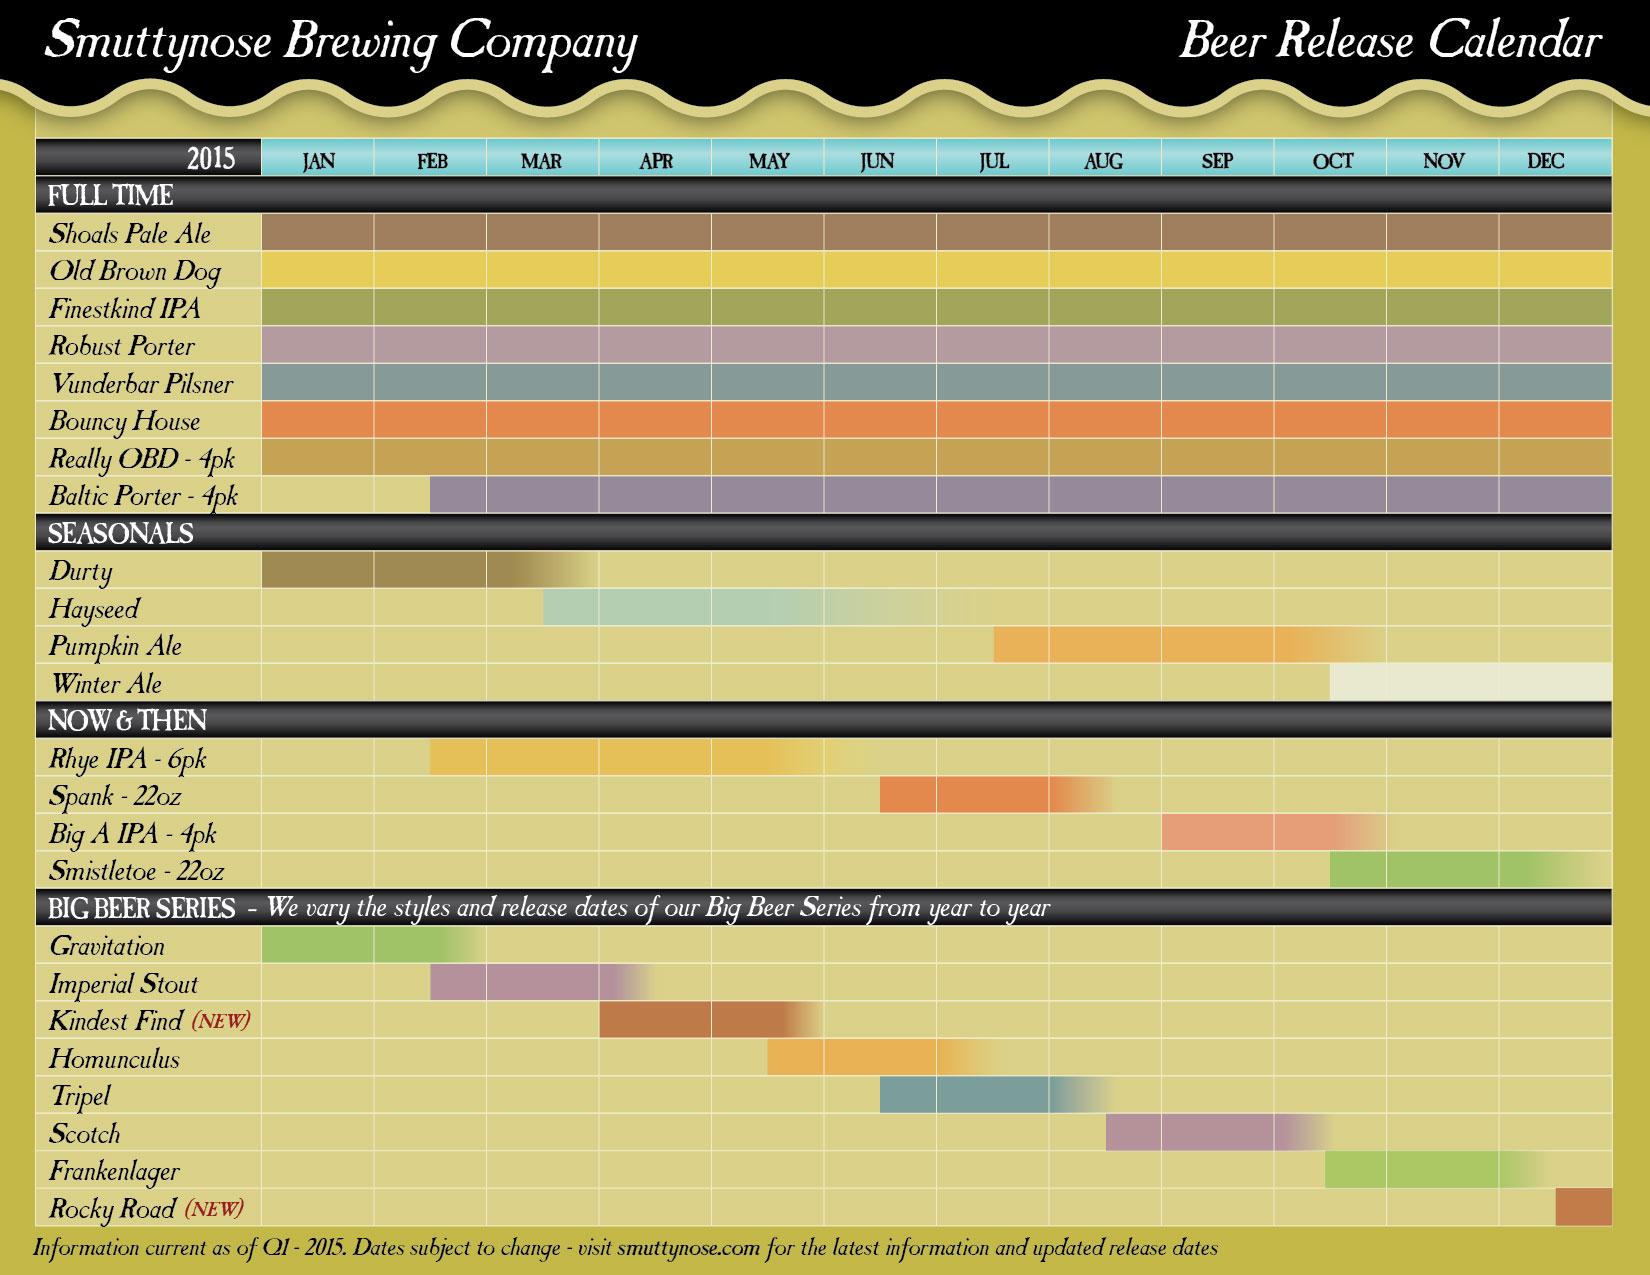 Calendar Q : Craft beer release calendars